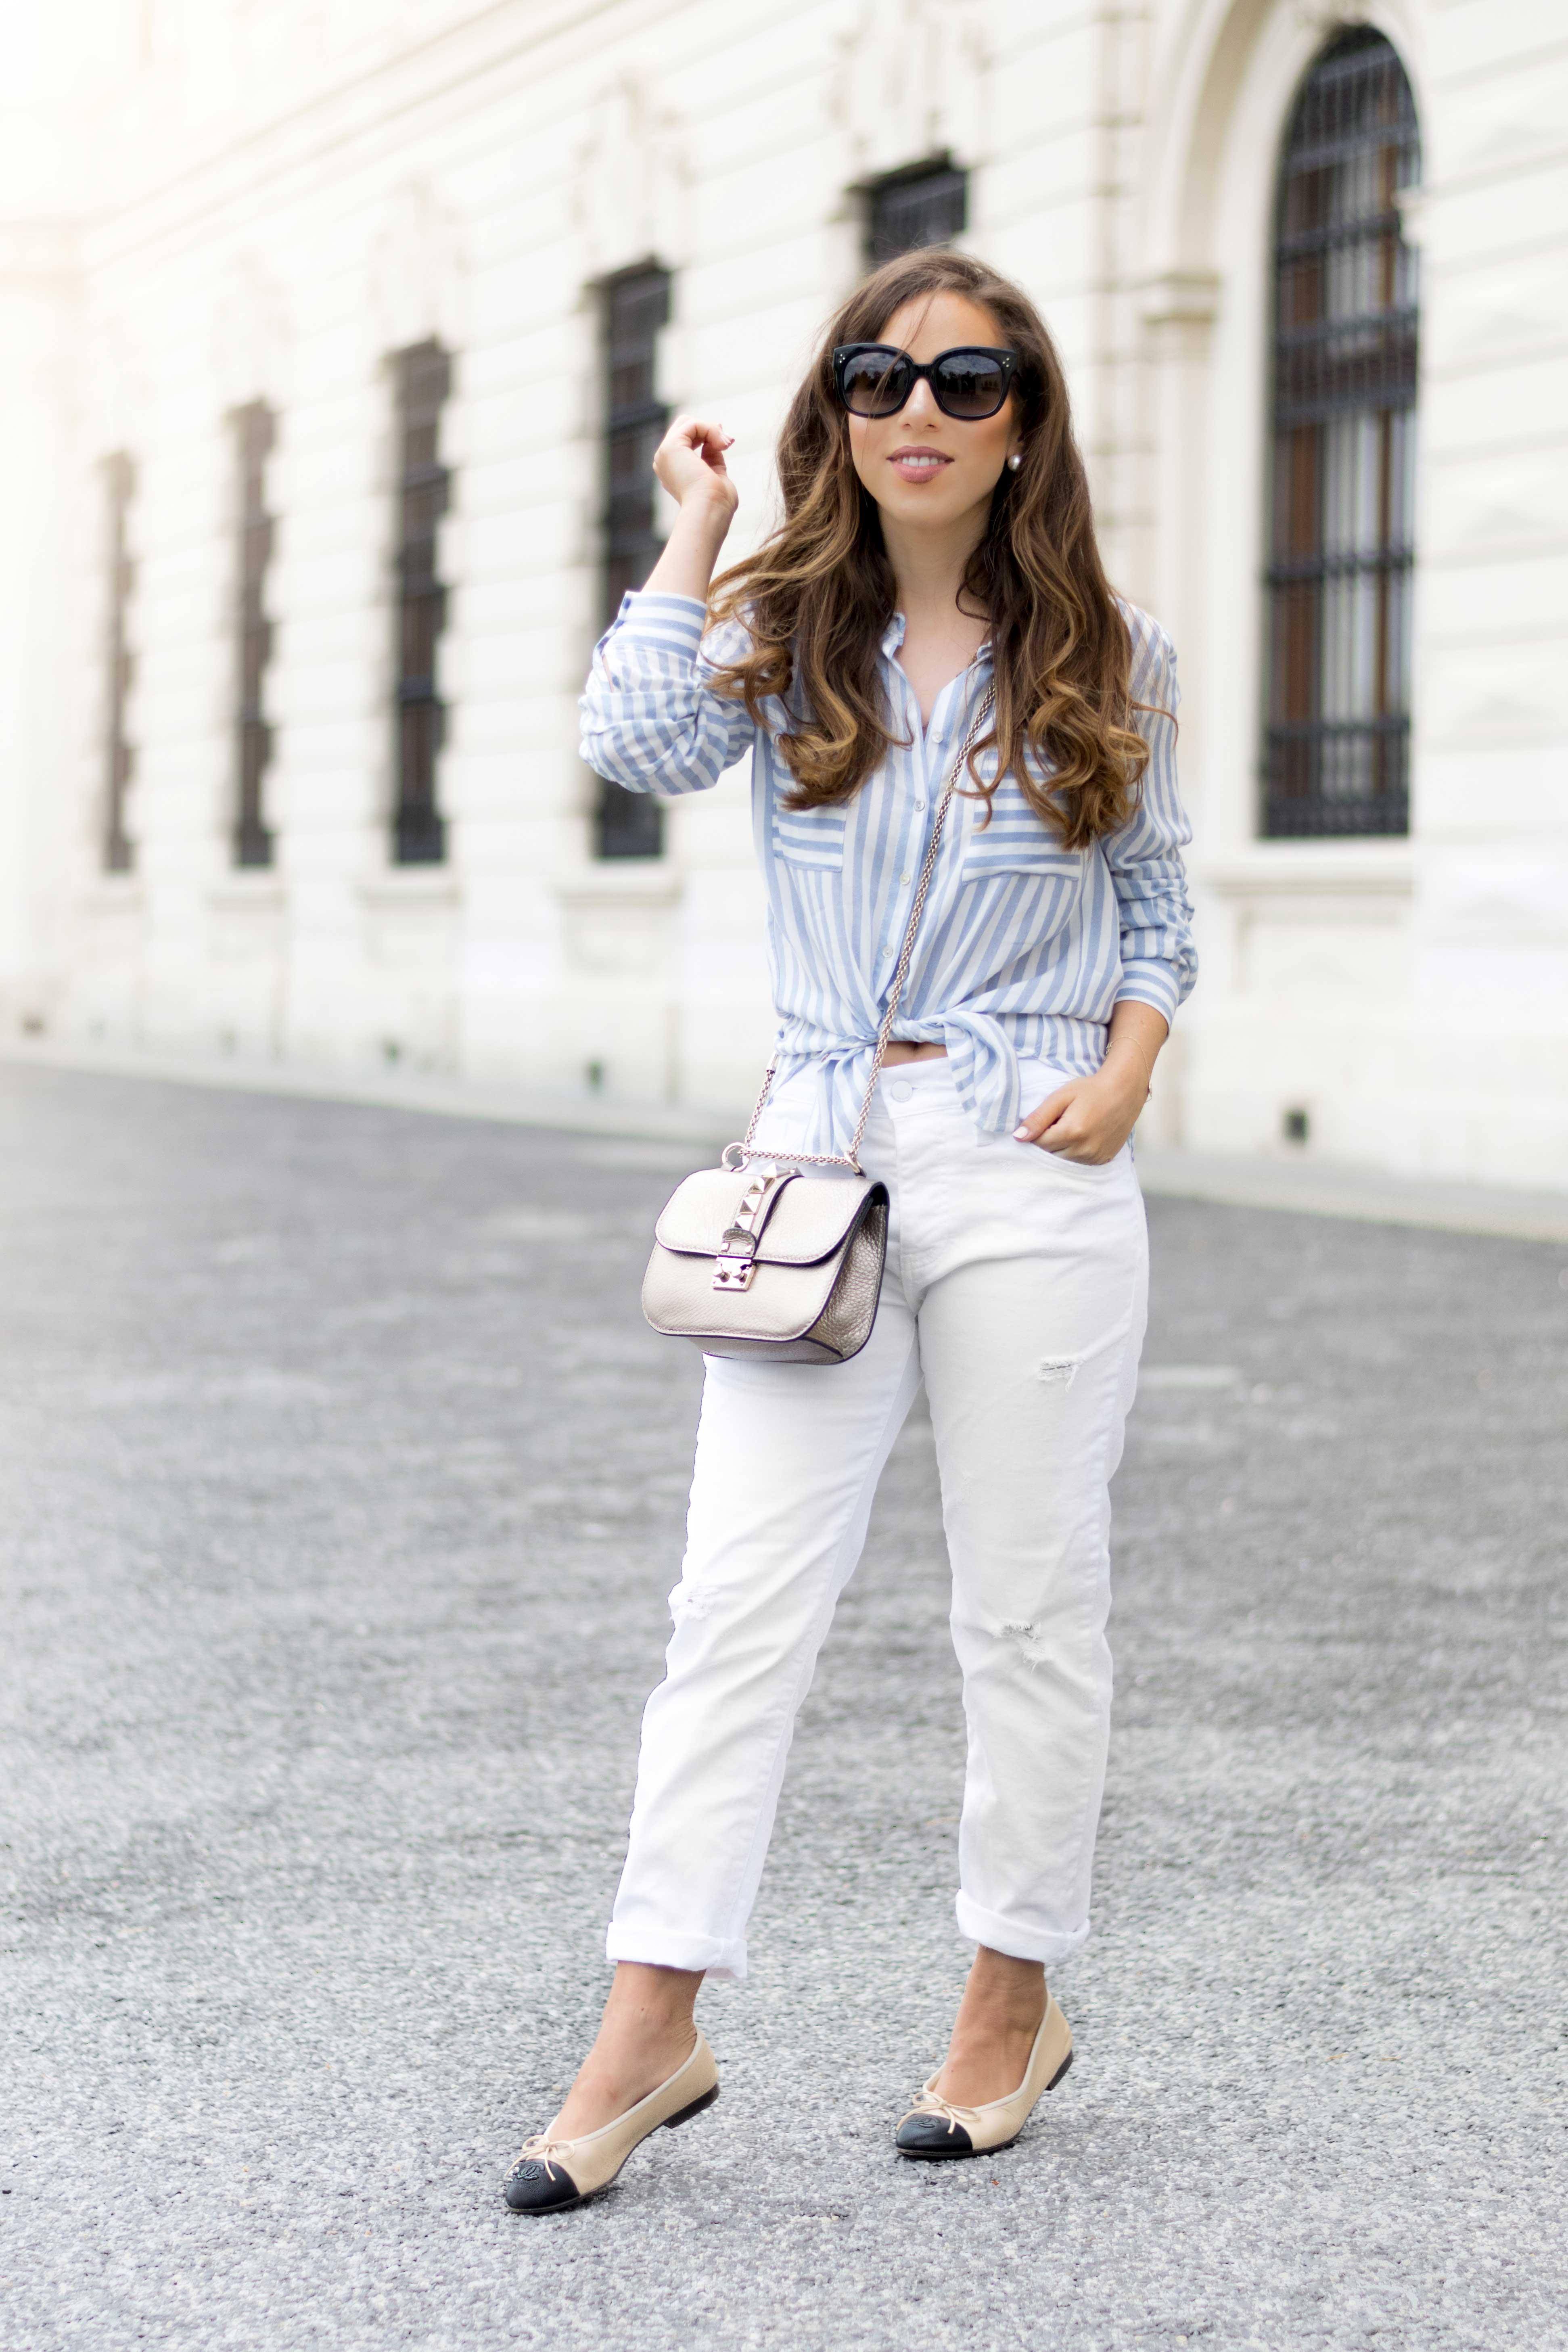 e4e11364134d Die perfekte Mom Jeans finden